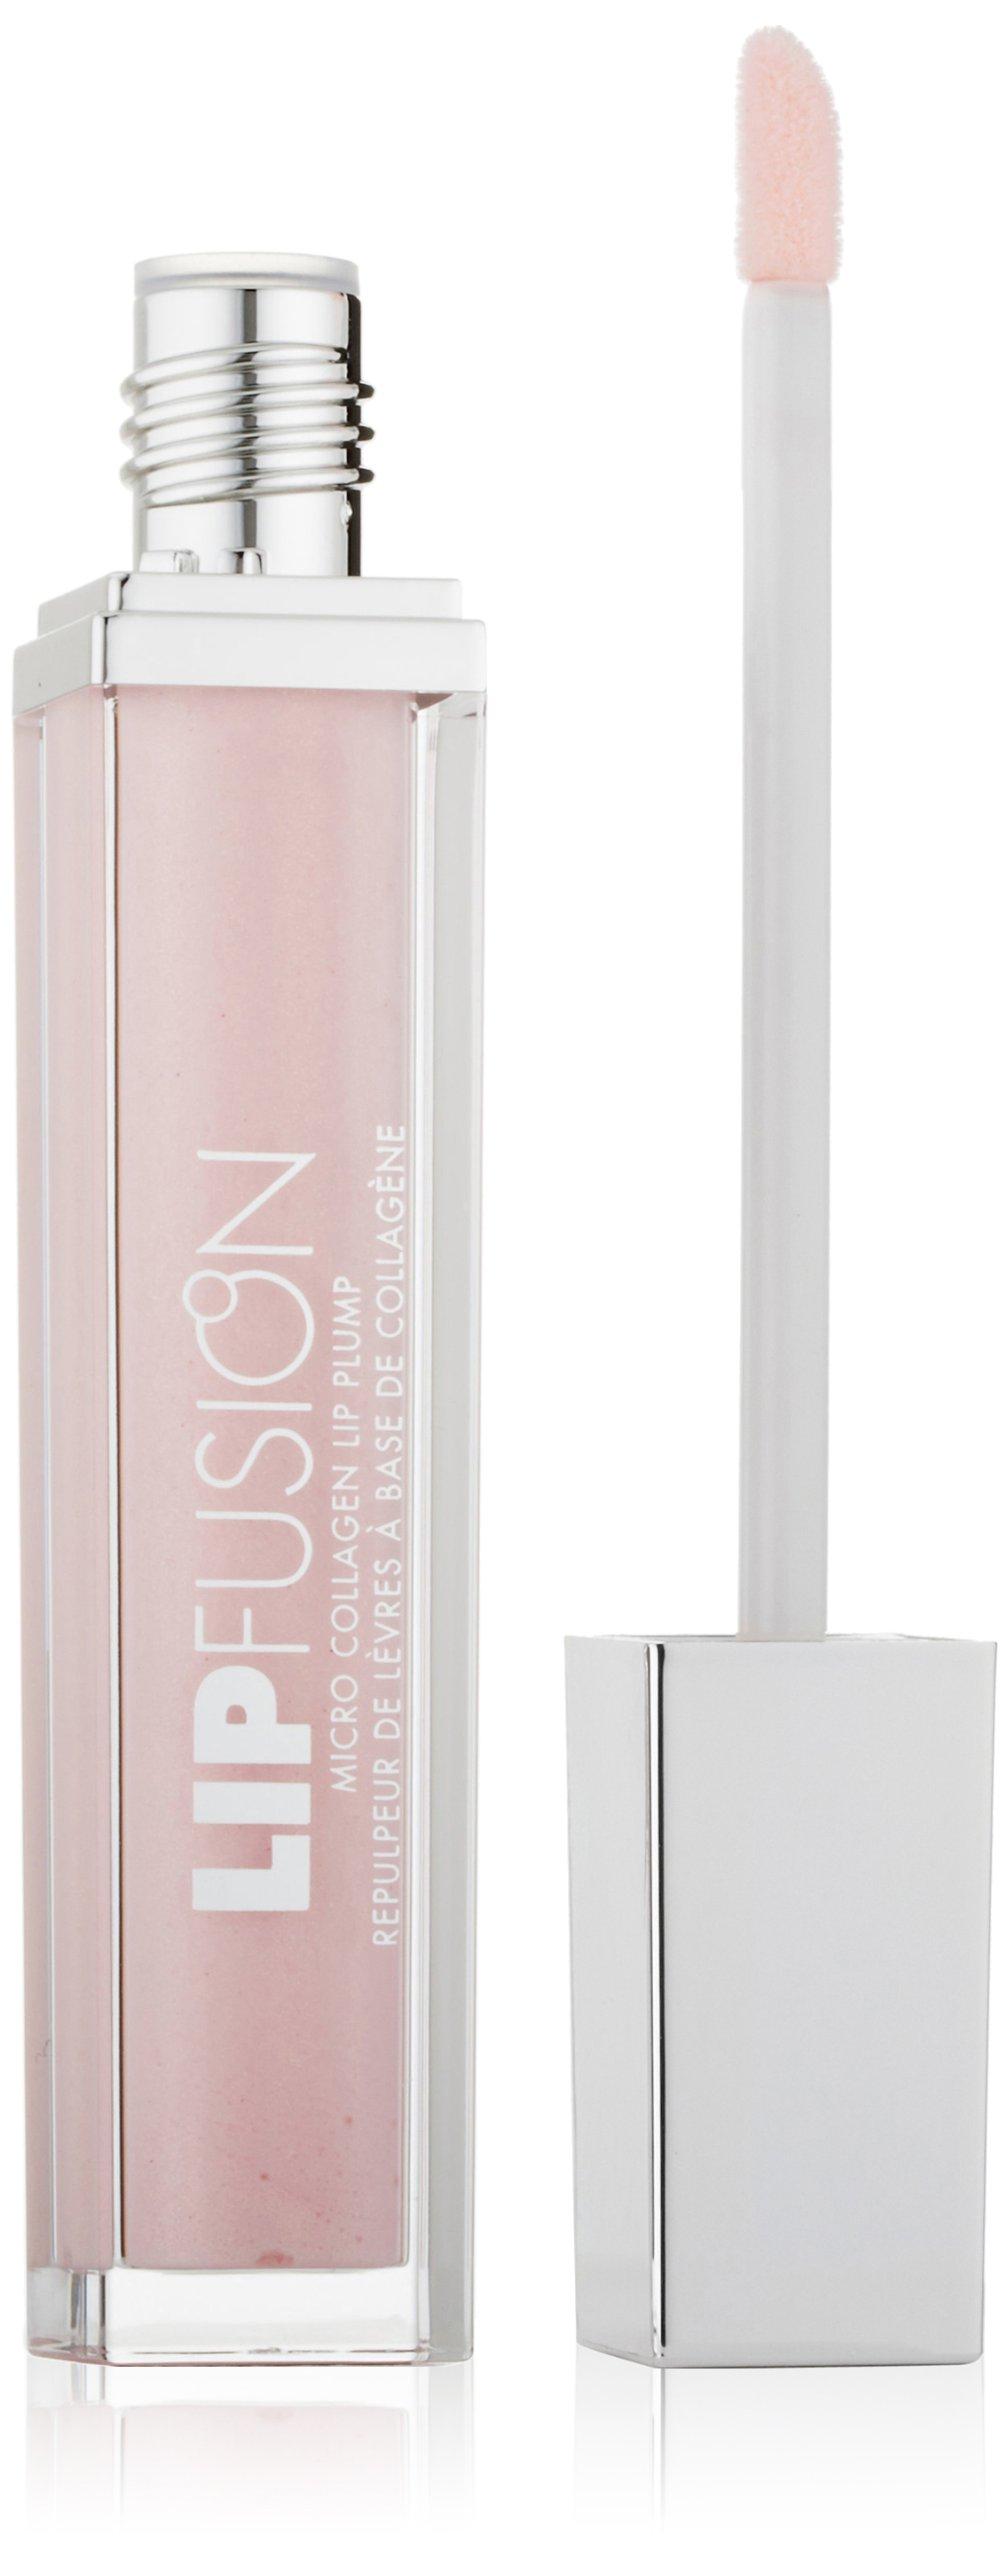 FusionBeauty LipFusion Micro-Injected Collagen Lip Plump Color Shine, Flirt